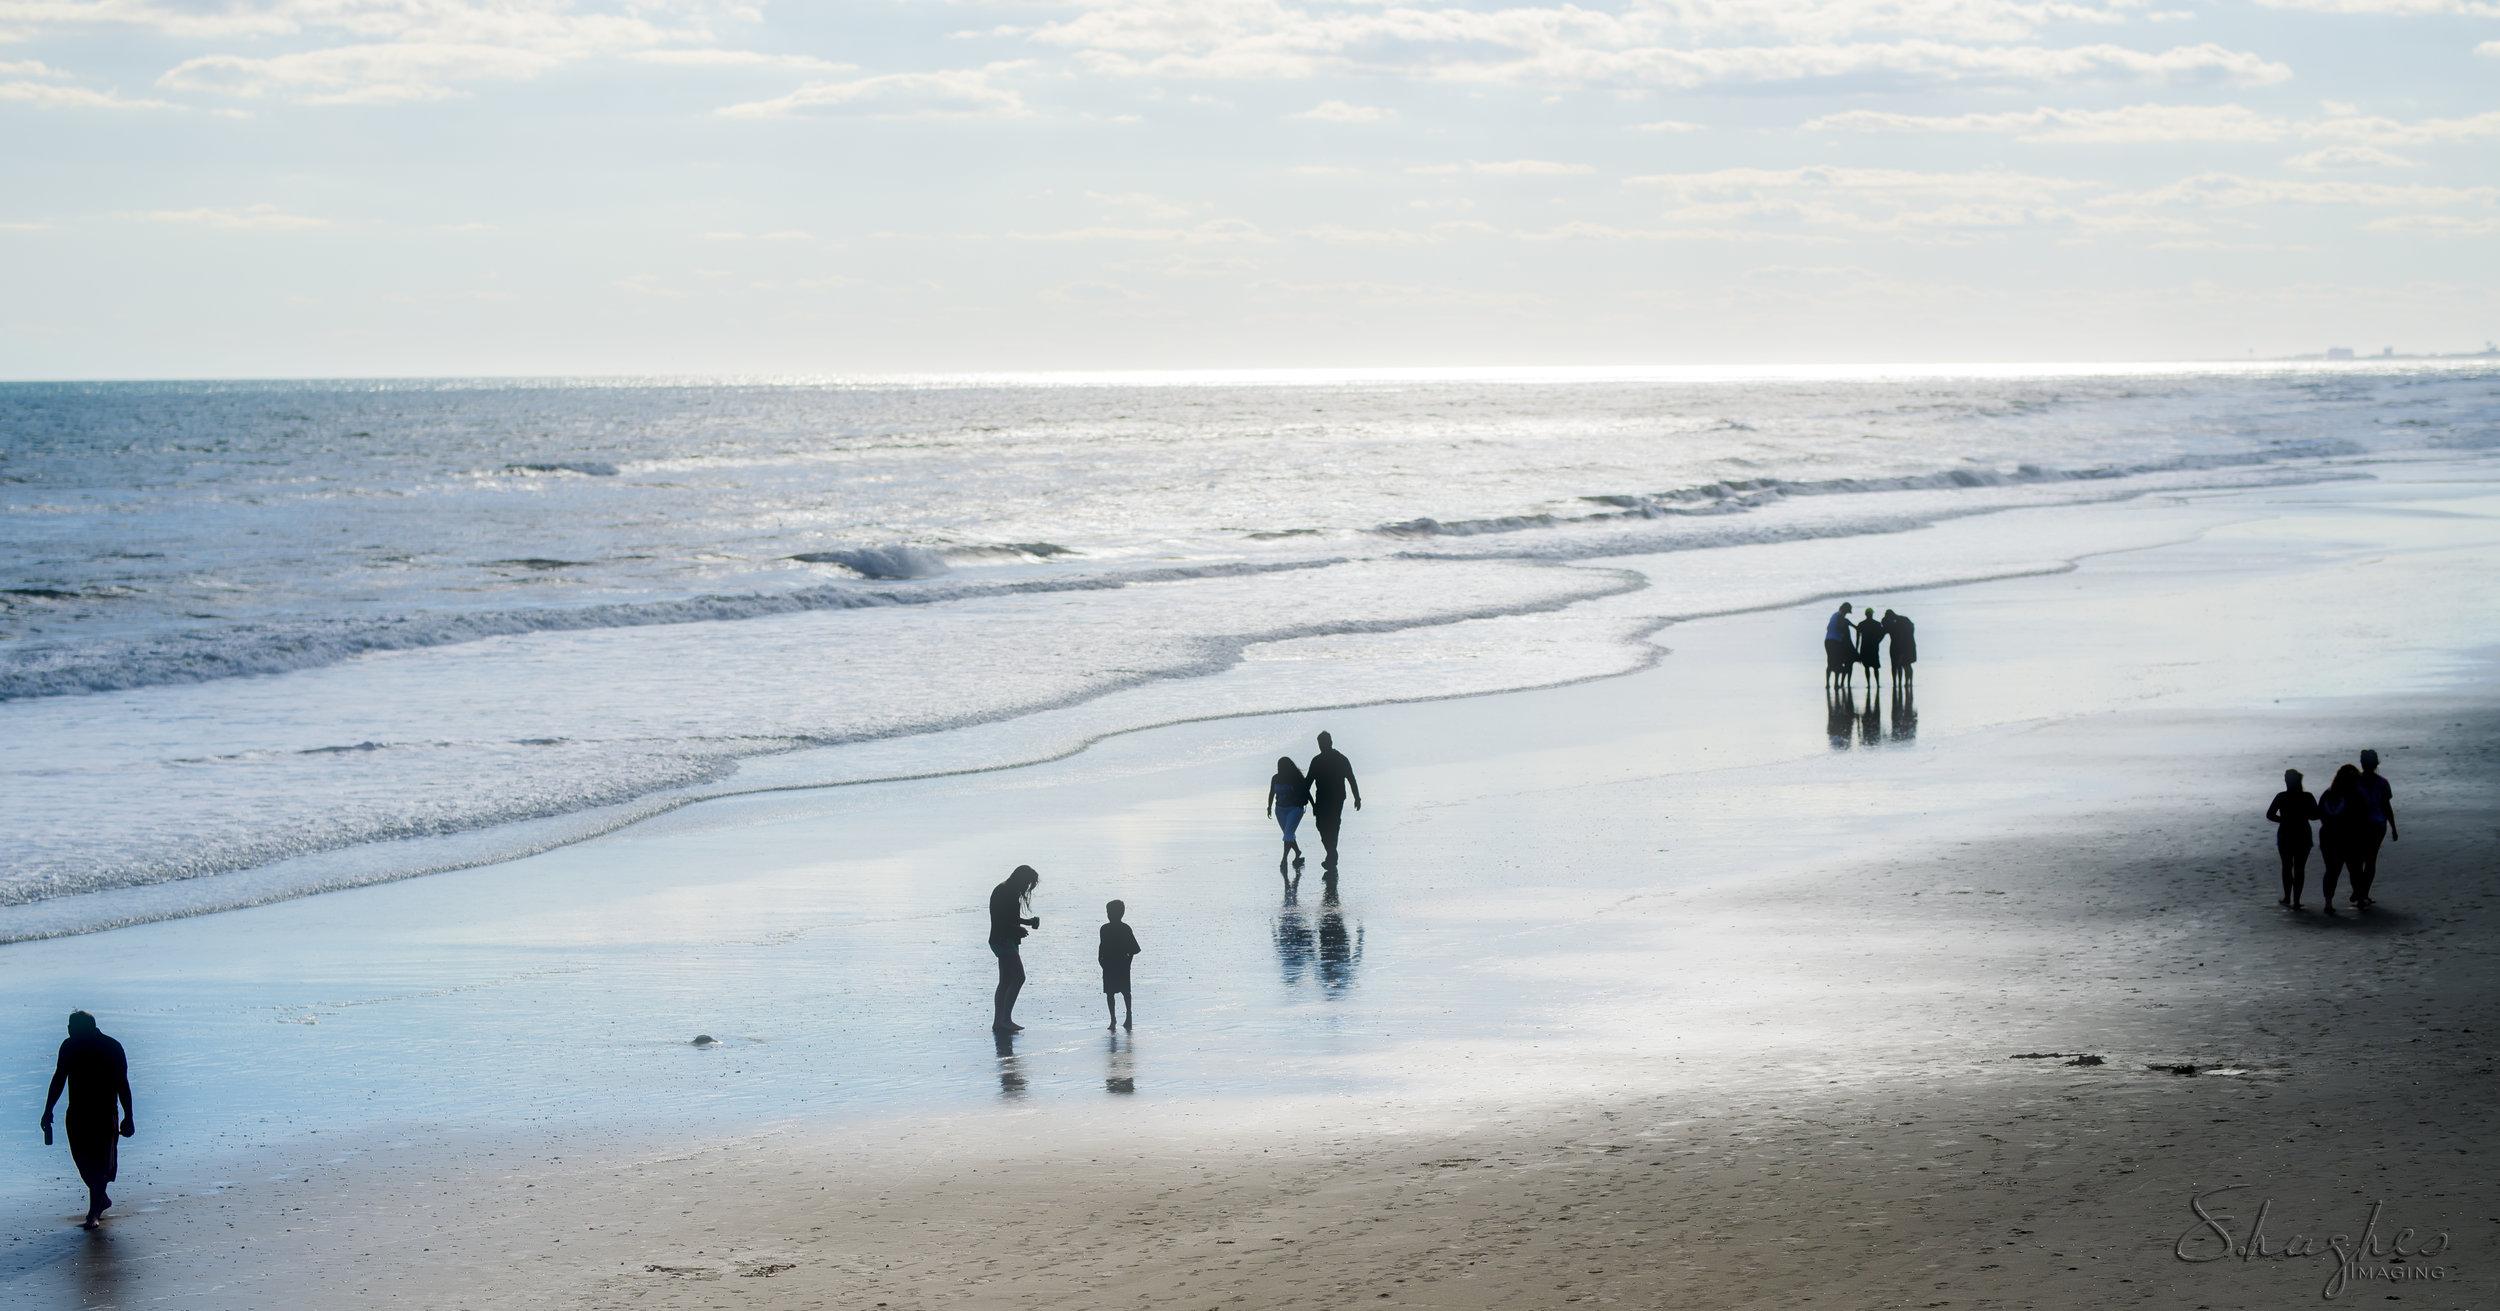 AtlanticBeach_Oceanna_ReflectionsonBeach5_422017.jpg